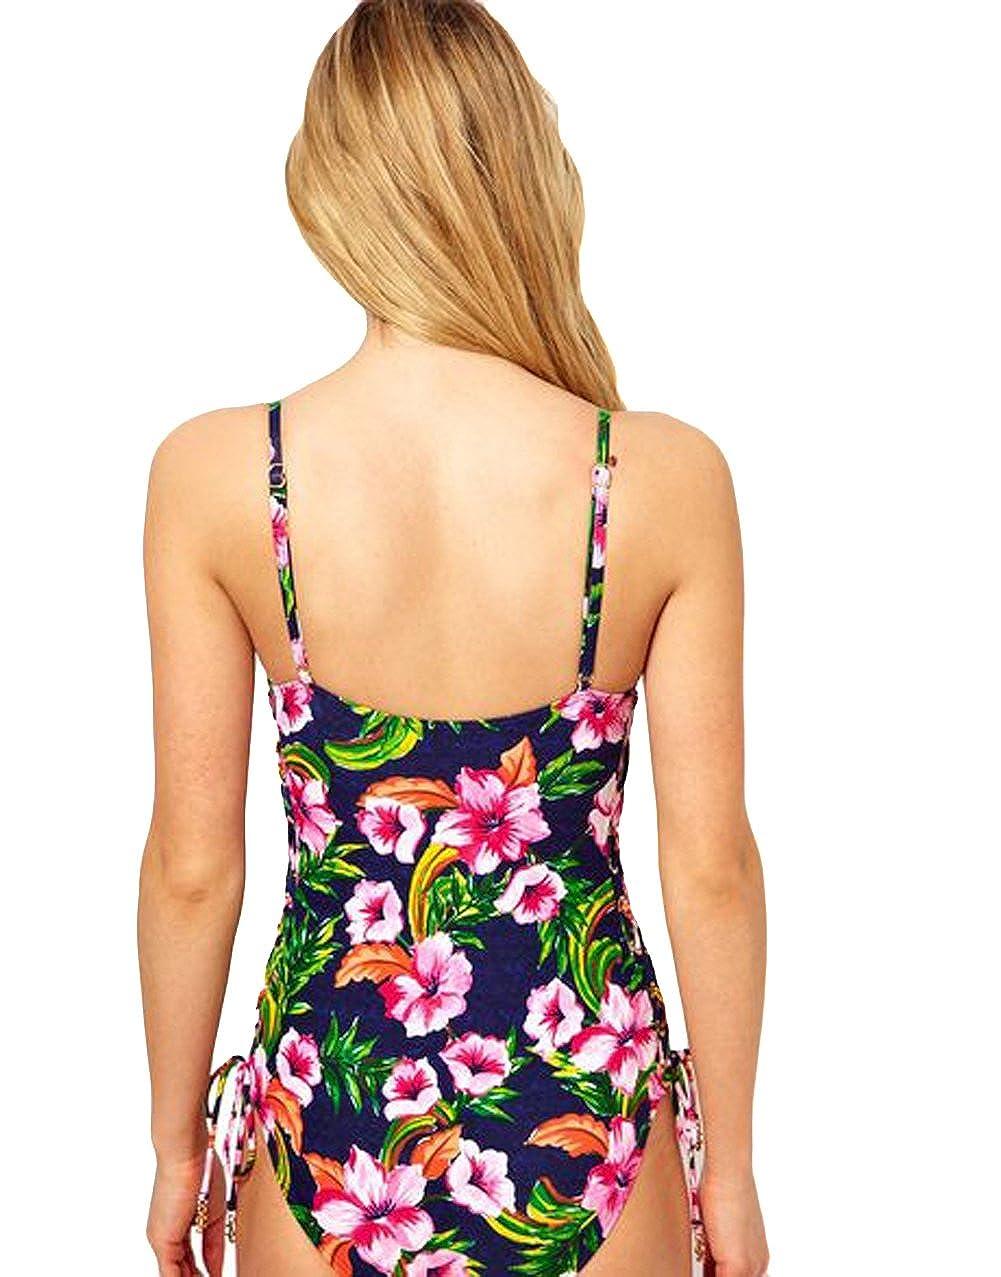 59dff6d8dfa Amazon.com: Juicy Couture Wild Flower Lace Up Swimsuit (XS): Clothing